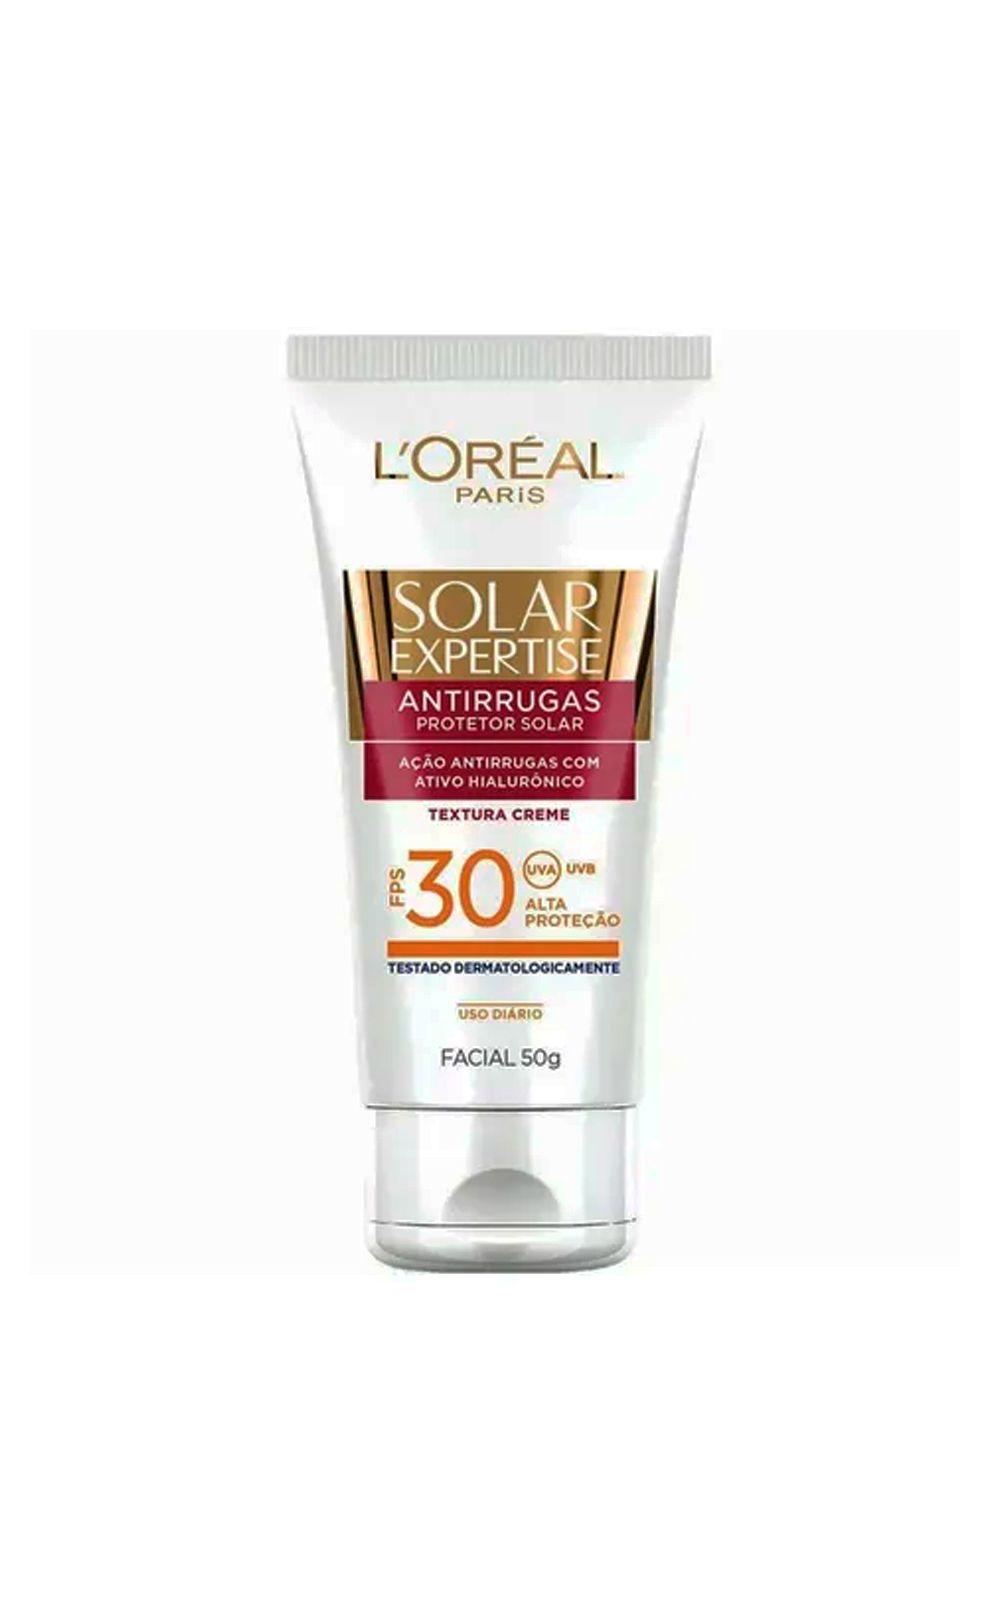 Foto 3 - L'Oréal Paris Solar Expertise Ganhe Solar Expertise Facial Antirrugas Kit - Protetor Solar Corporal + Protetor Solar Facial - Kit